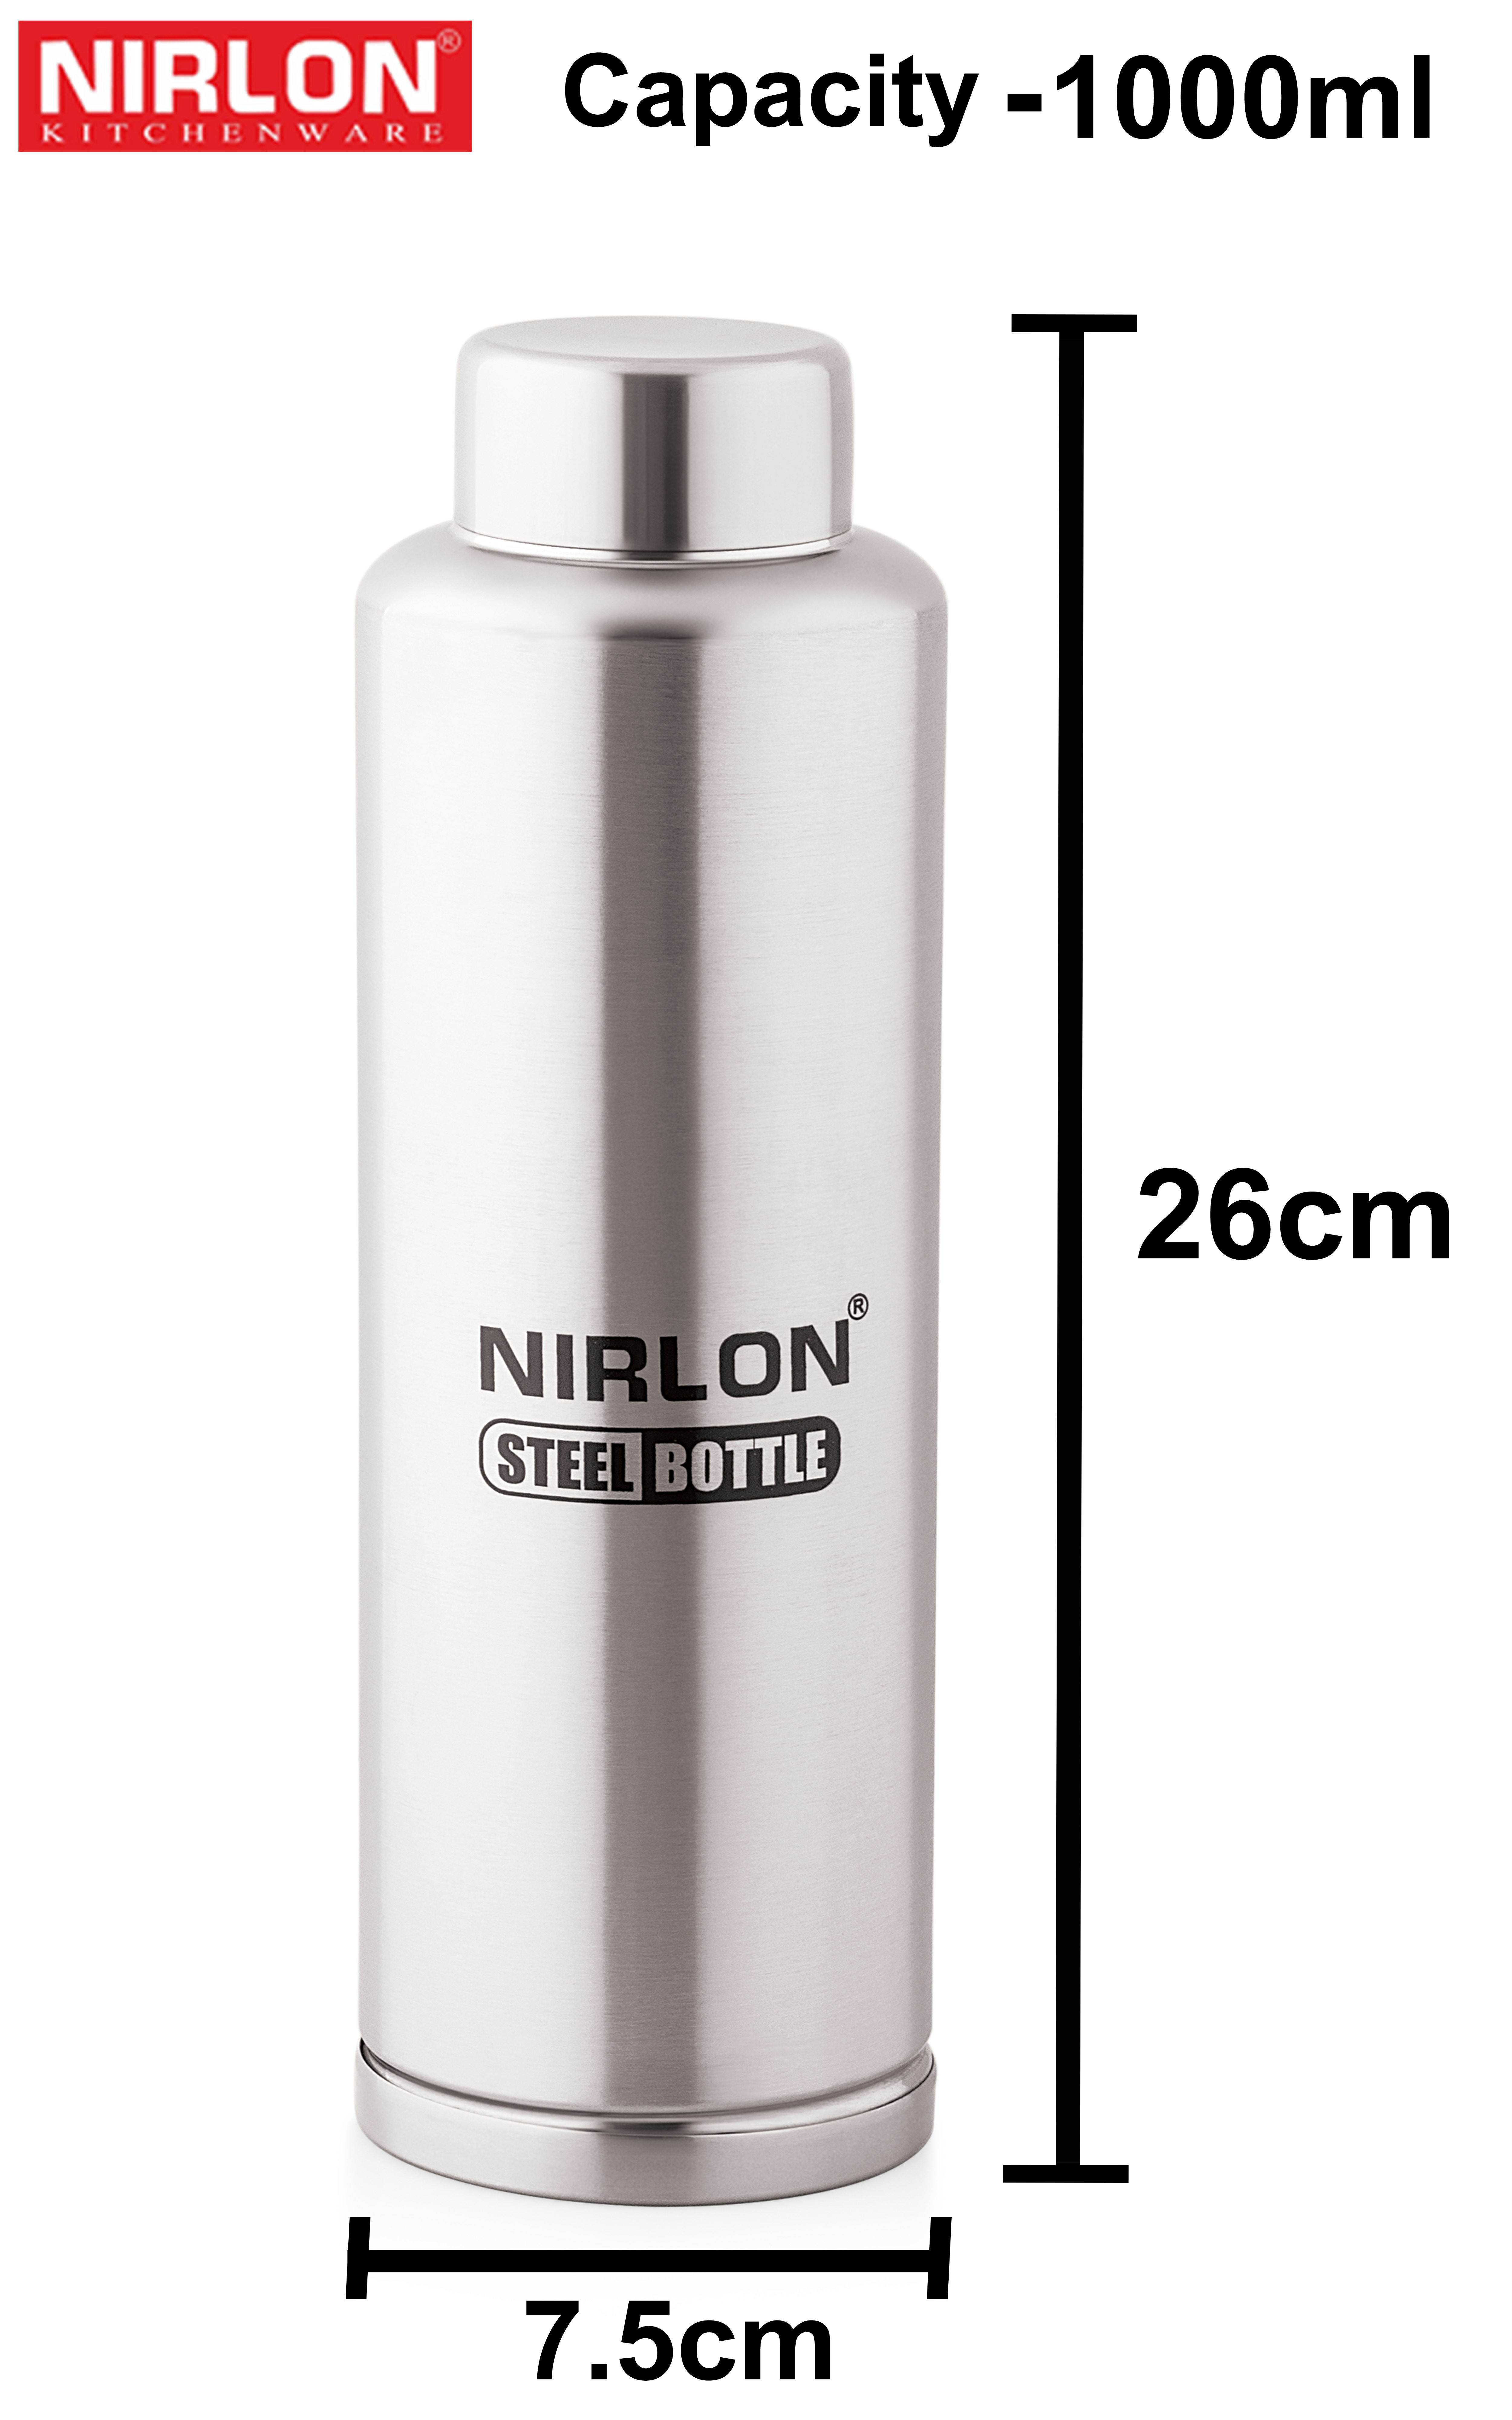 1000ml Insulated Steel Bottle